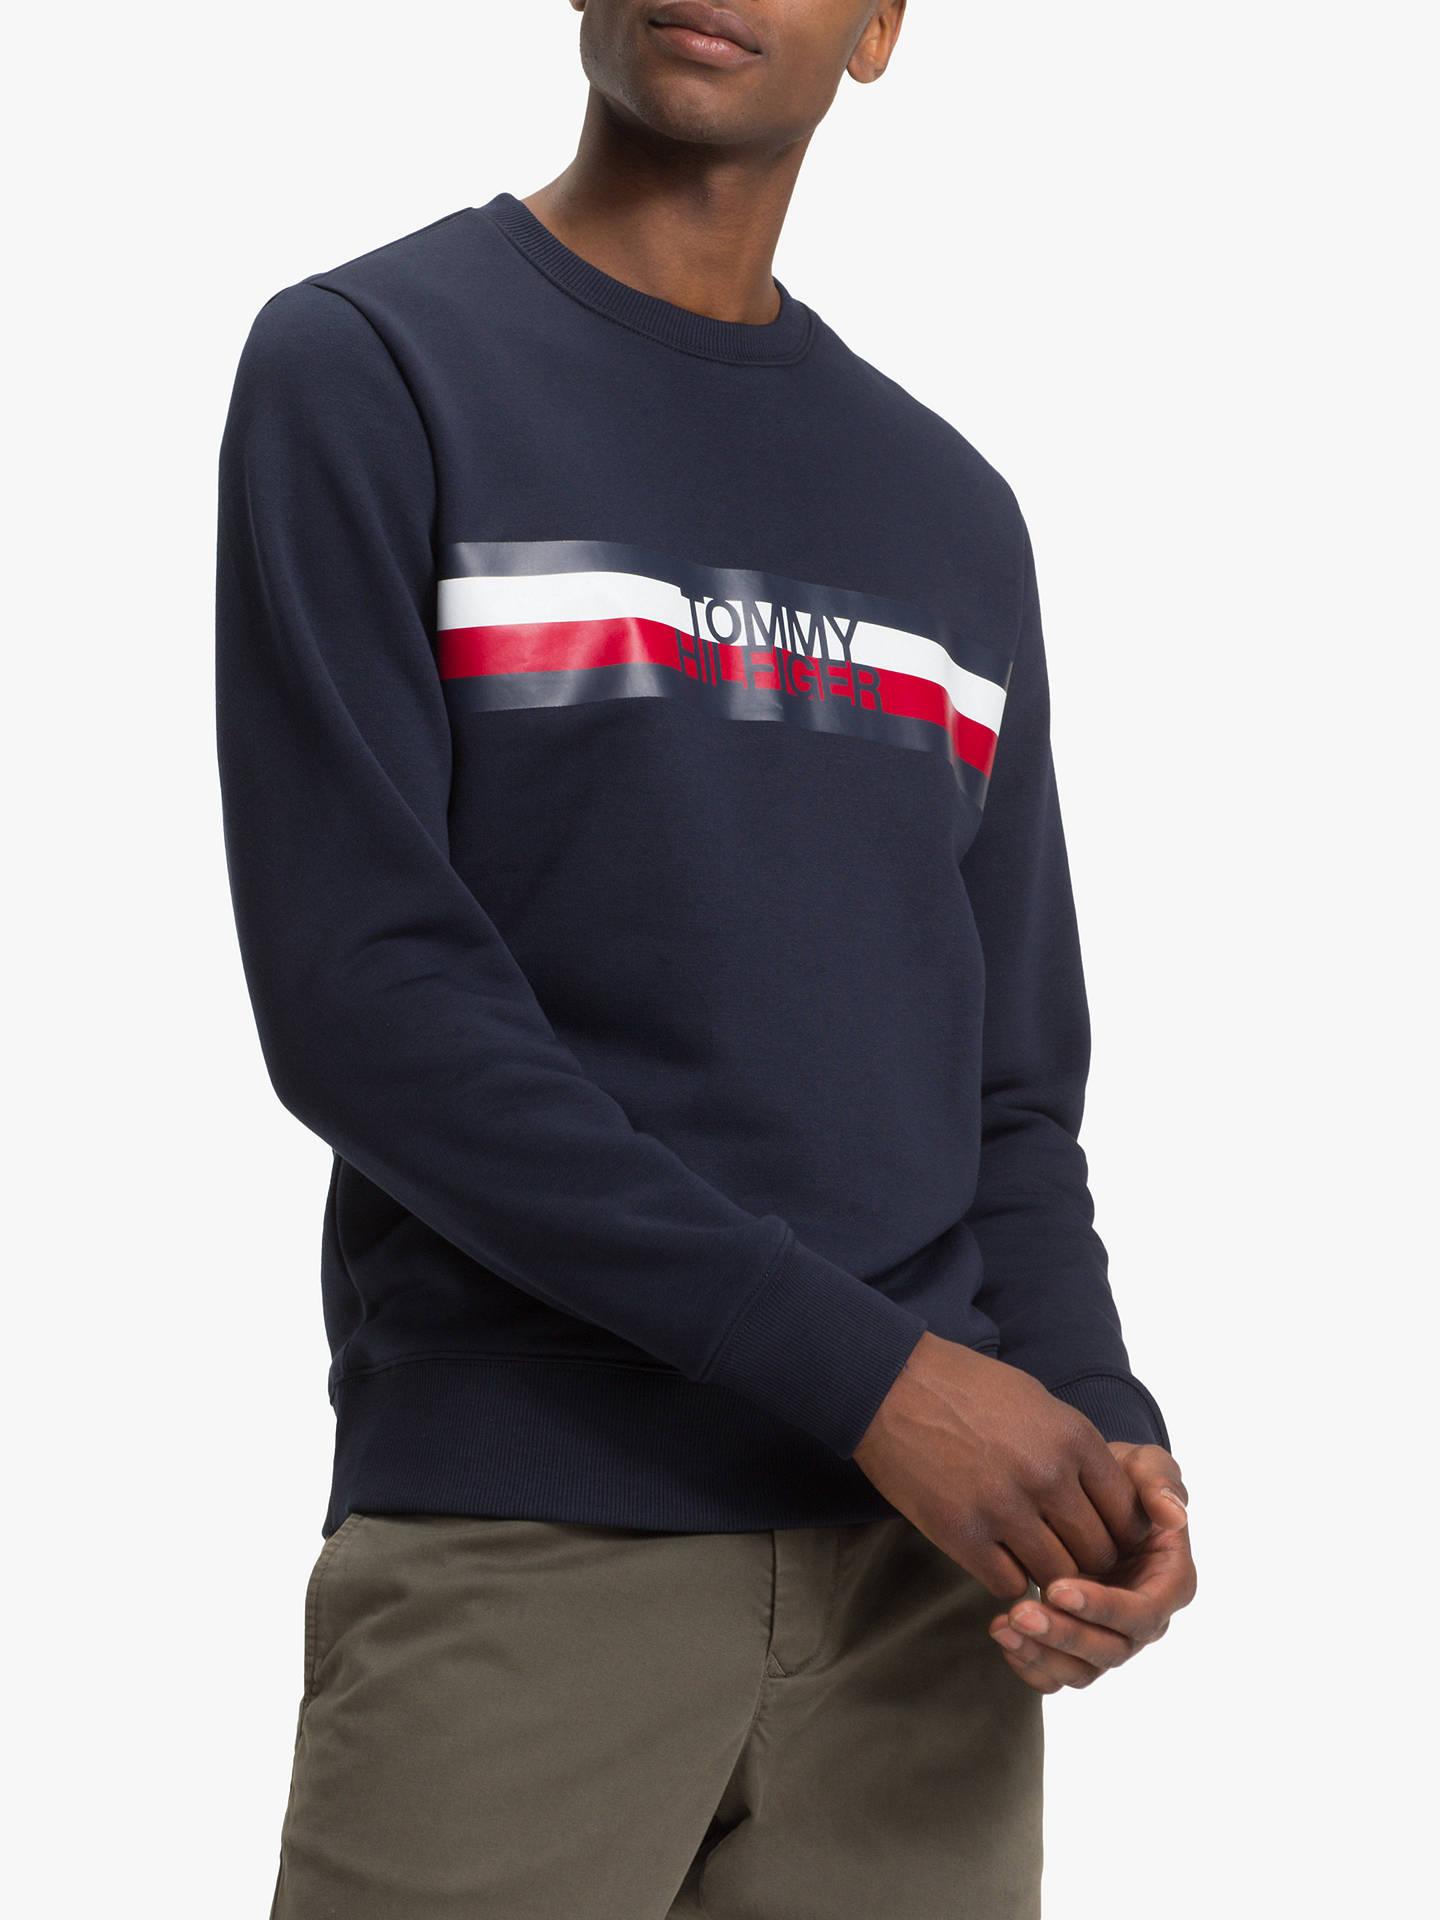 Tommy Hilfiger Logo Sweatshirt, Sky Captain at John Lewis